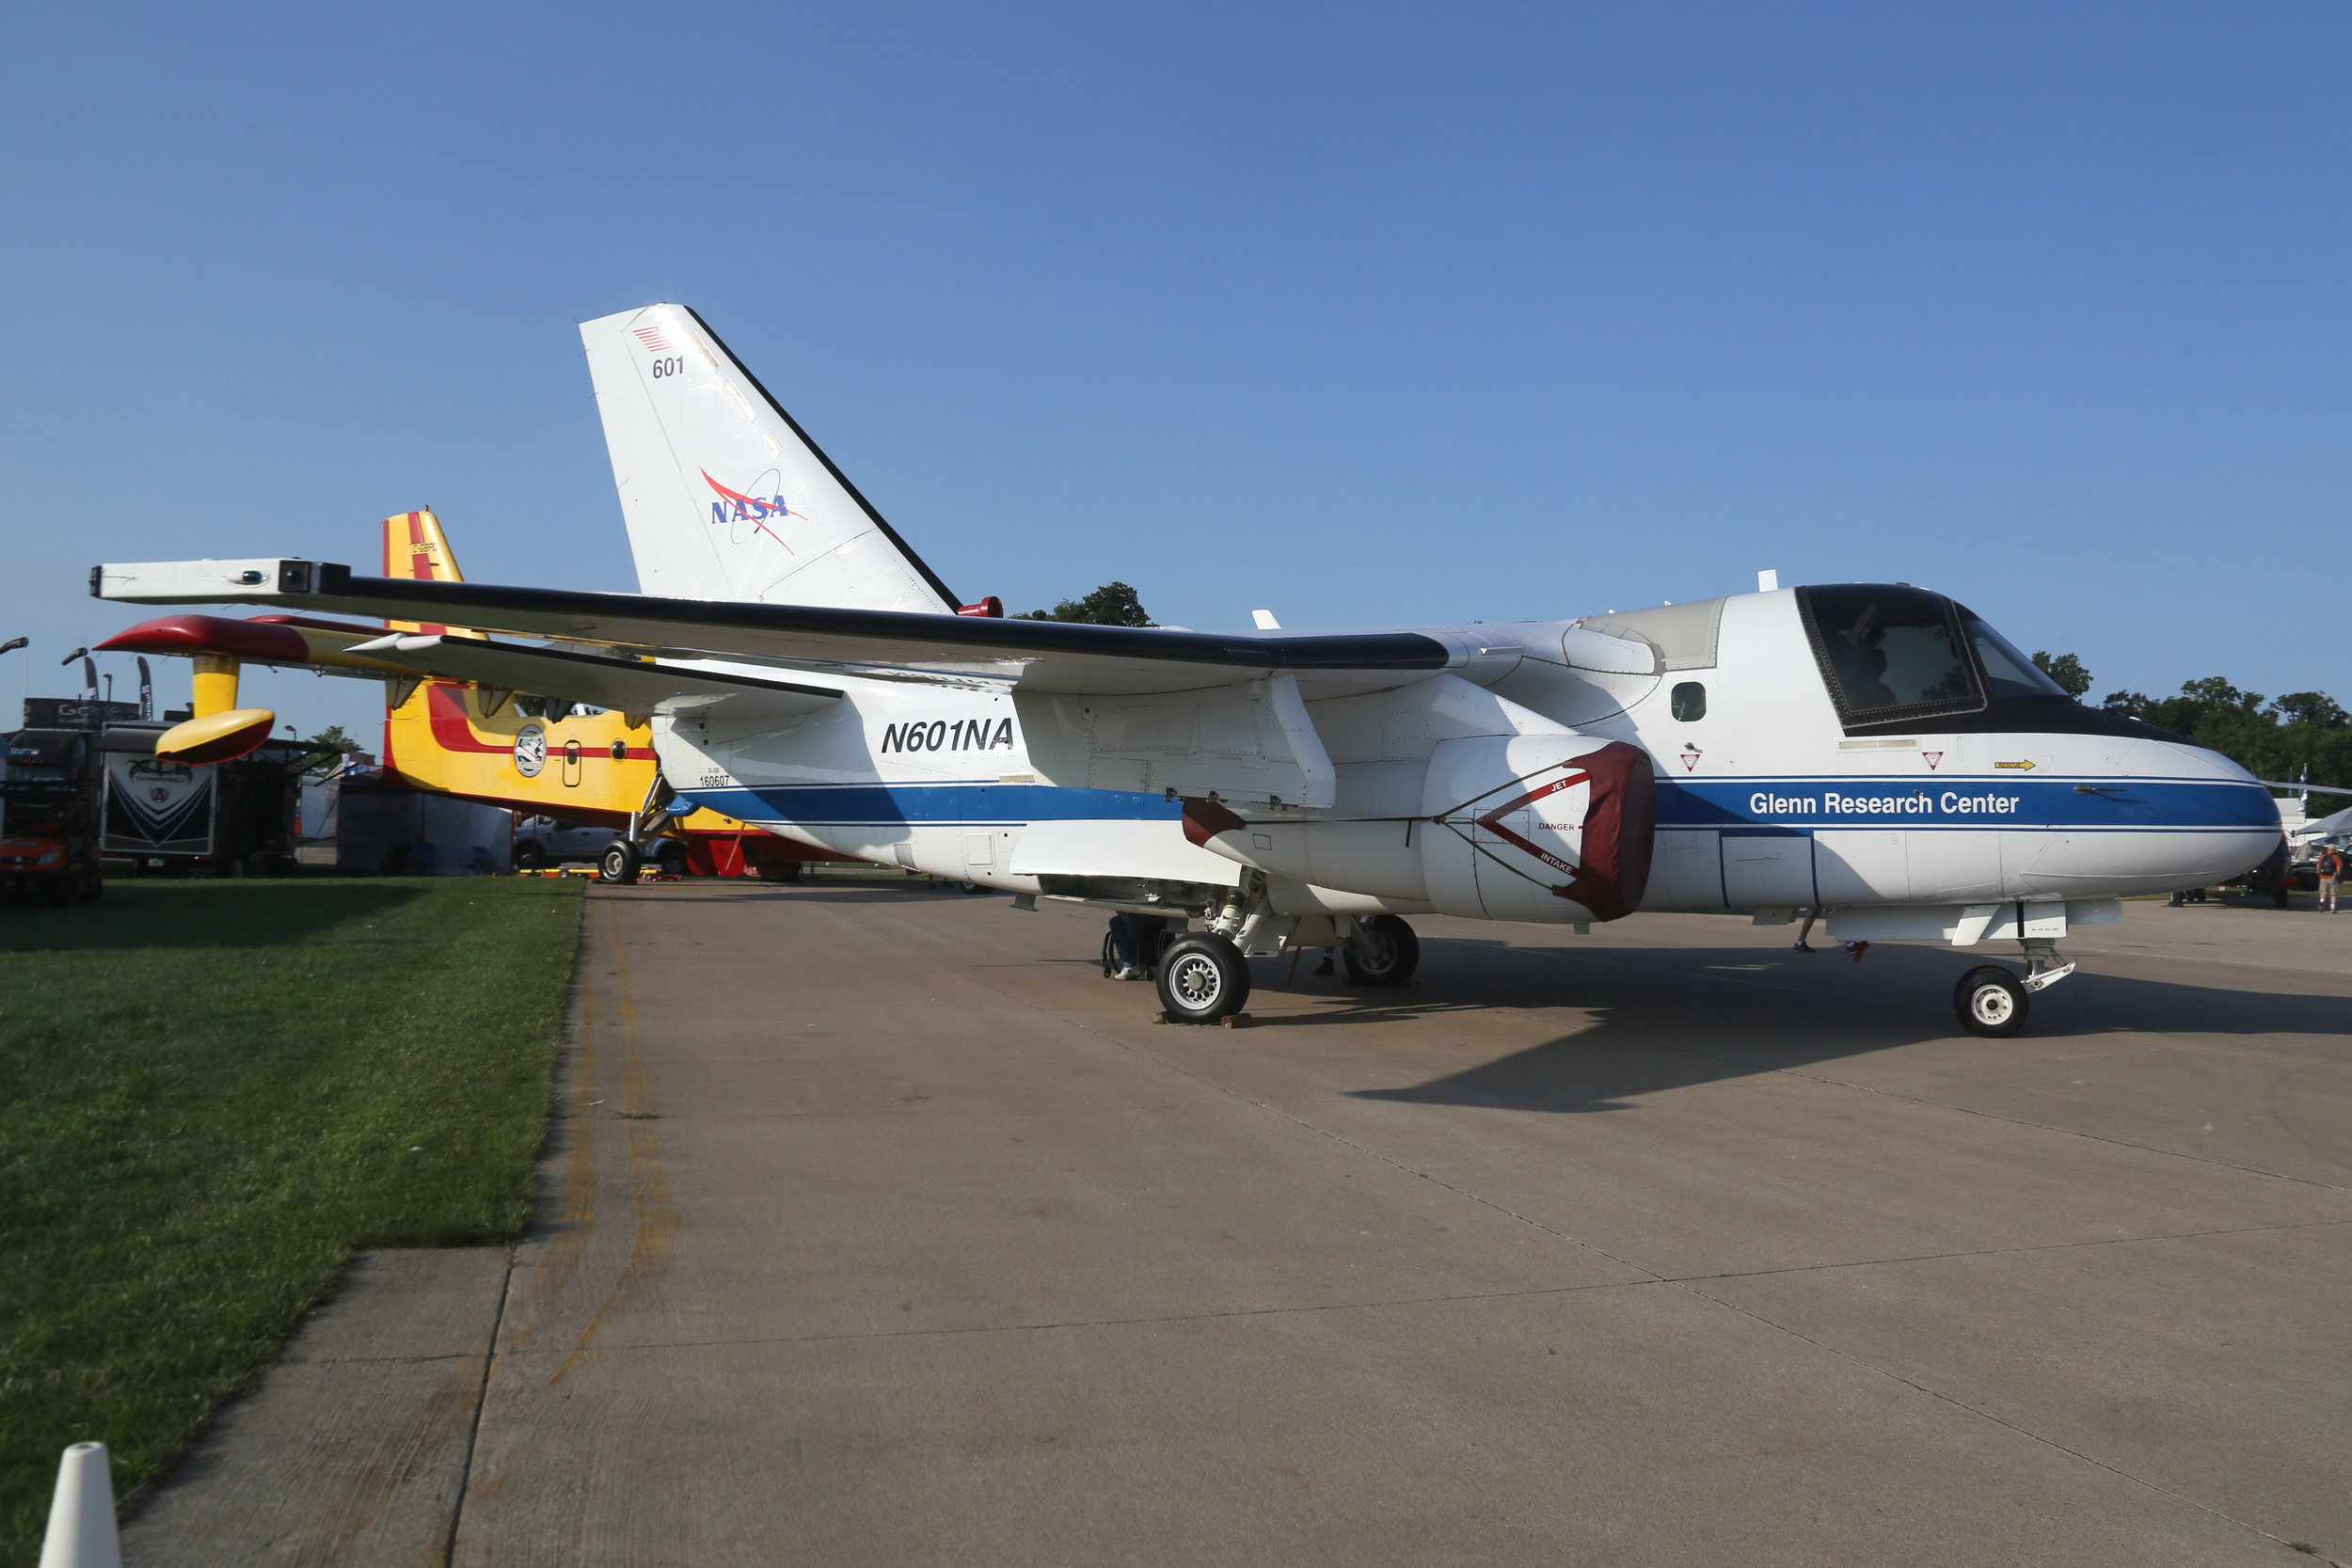 N601NA Lockheed S3 Viking taken at Oshkosh 25th July 2018 by John Wood